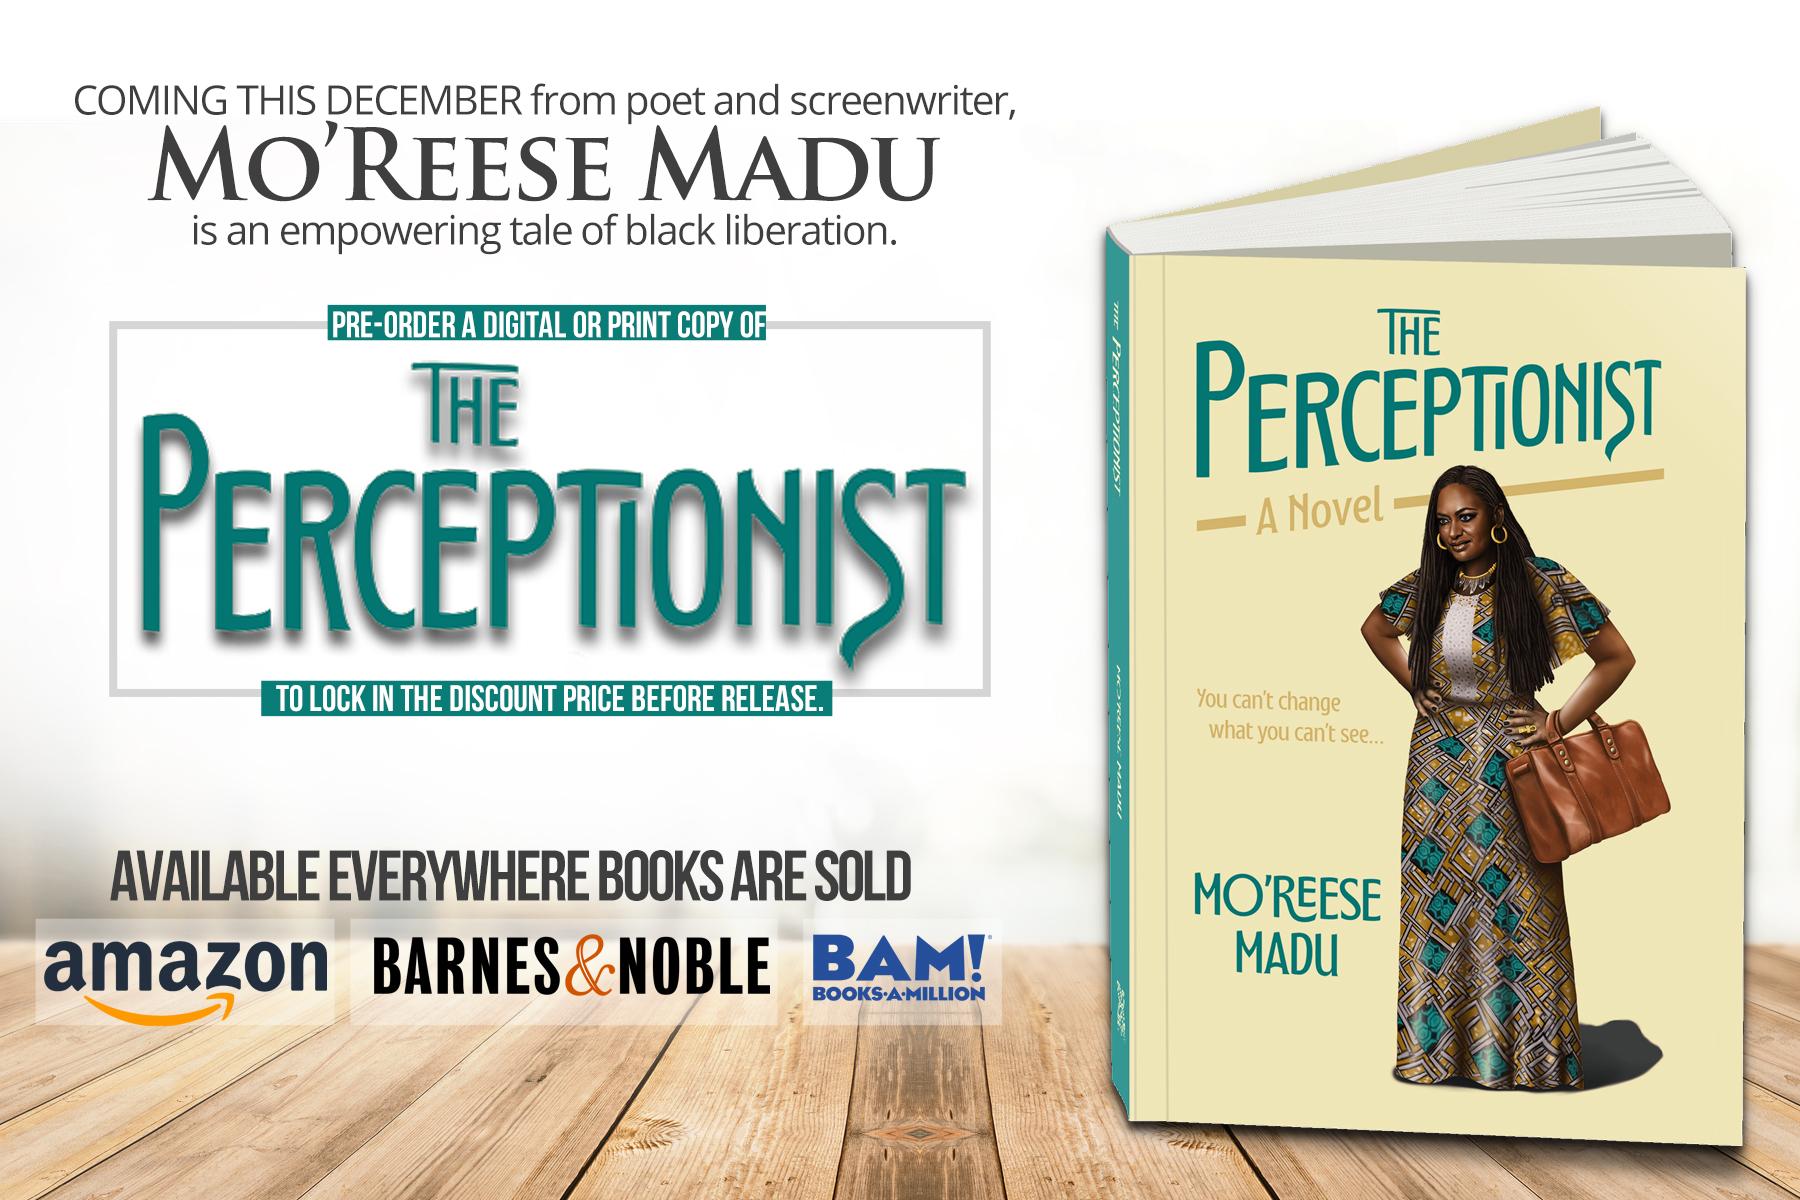 The Perceptionist